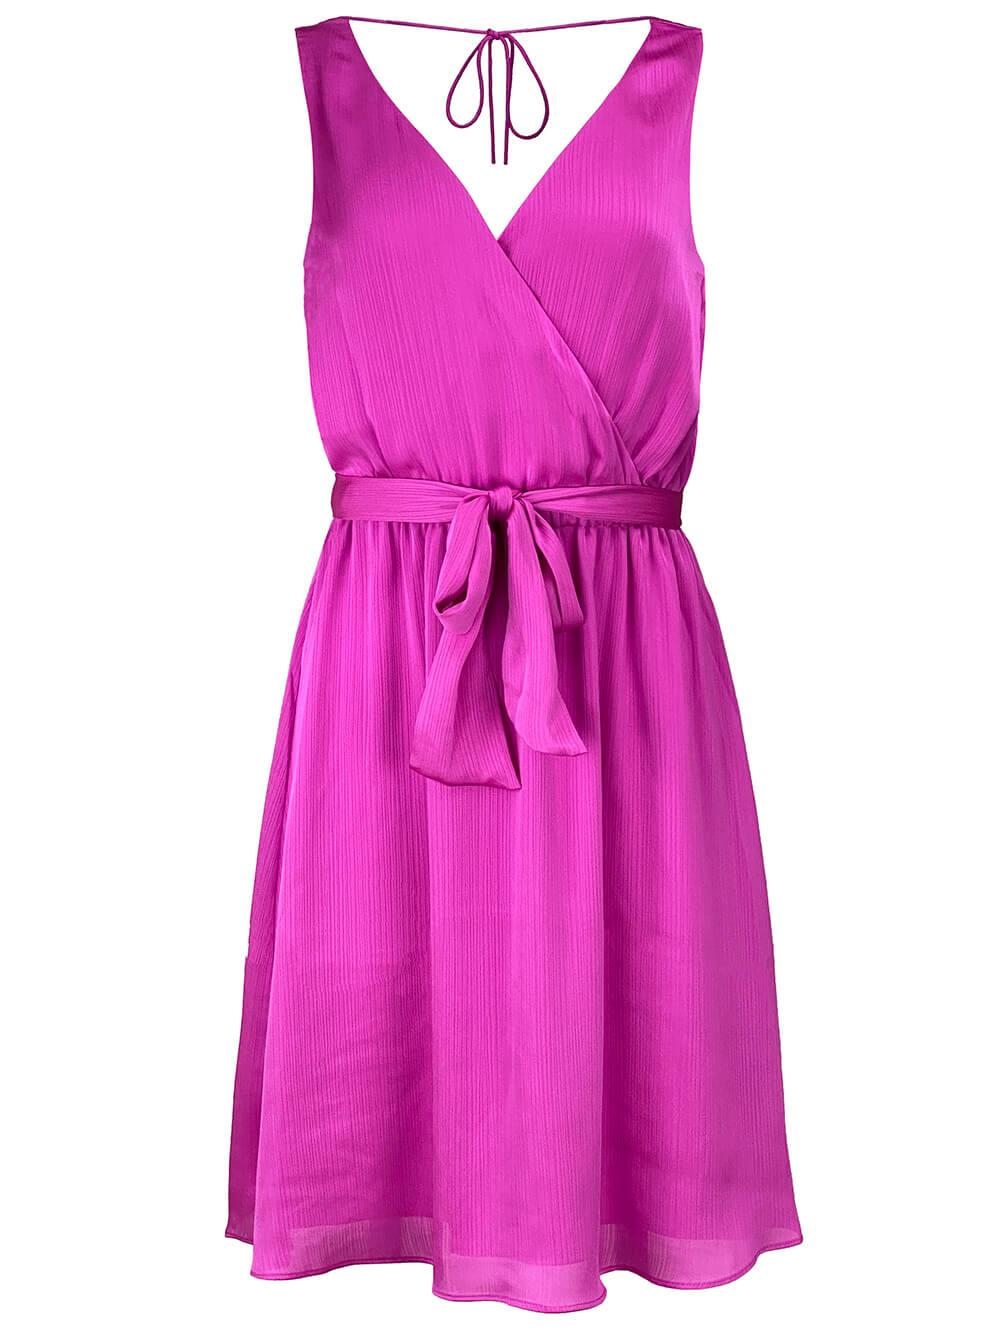 Planetary Dress Item # 2105324GG1